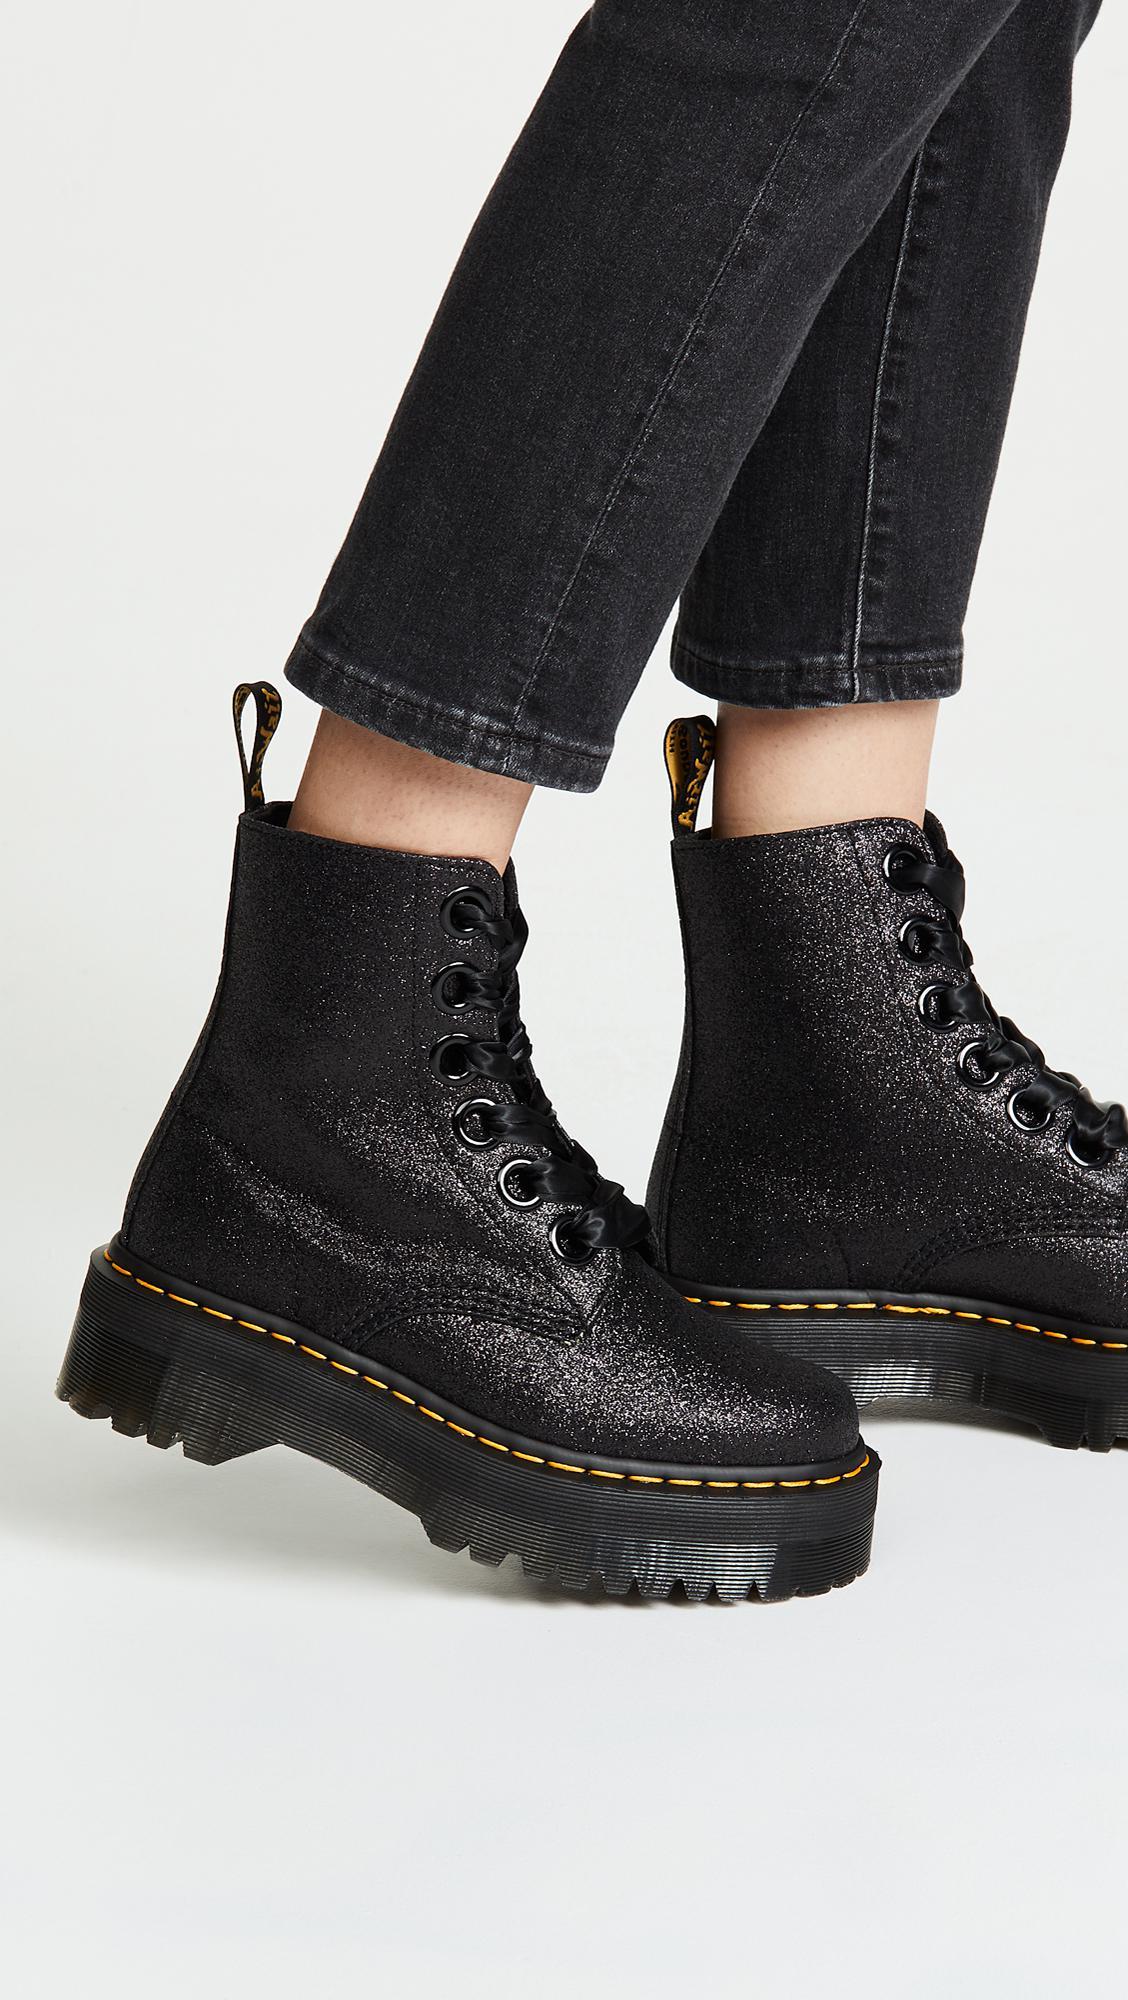 978c374ae Dr. Martens Molly Glitter 6 Eye Boots in Black - Lyst